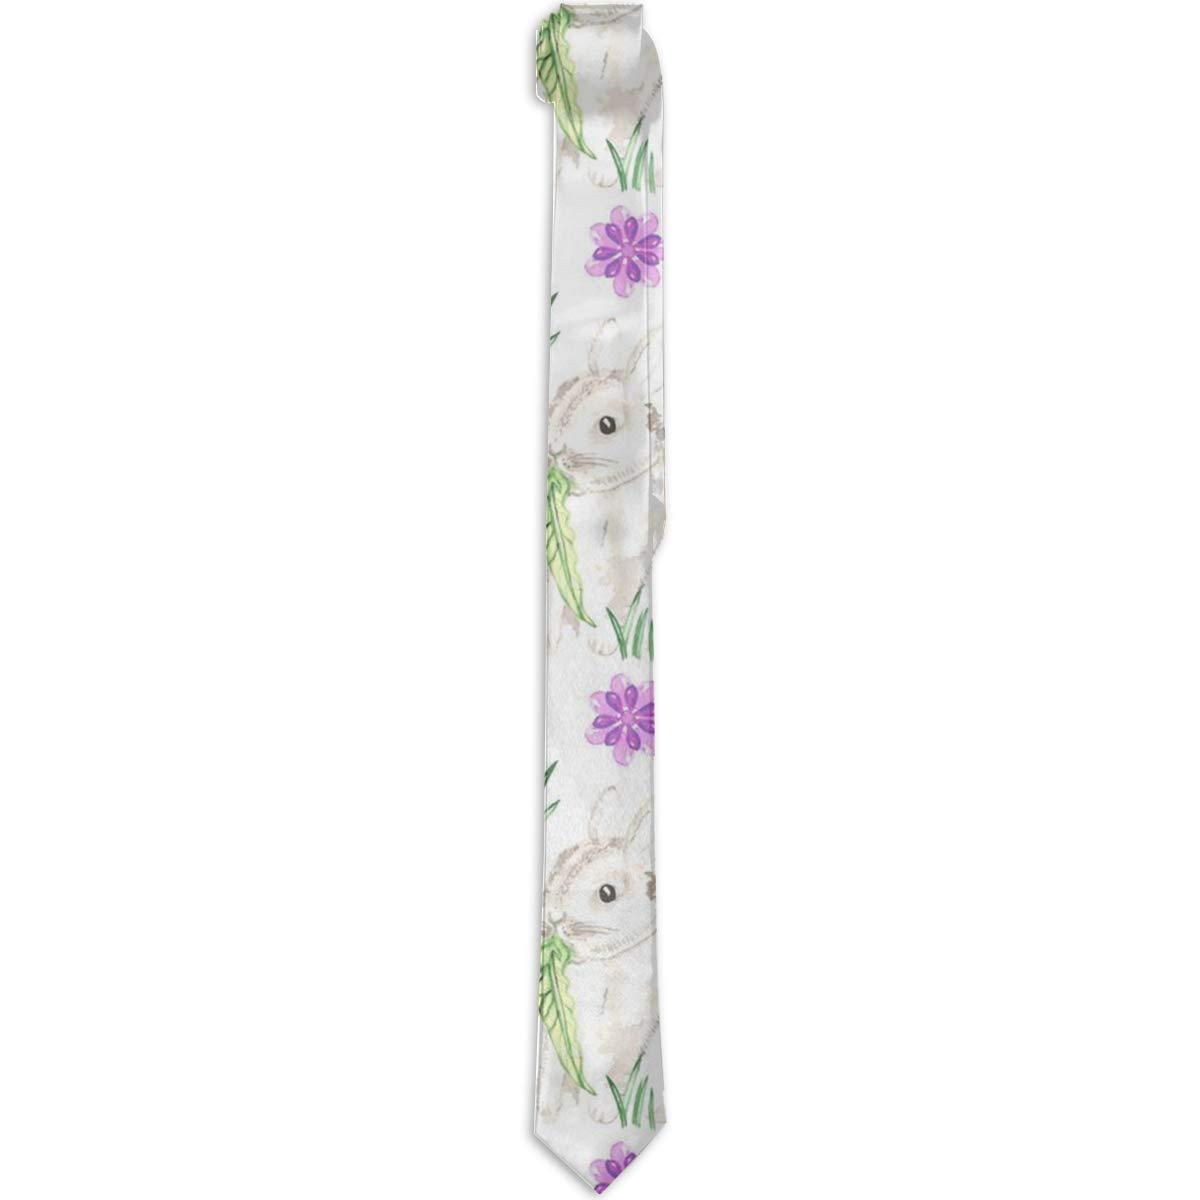 Formal Party Skinny Tie for Wedding Reception Boys Gift Tie